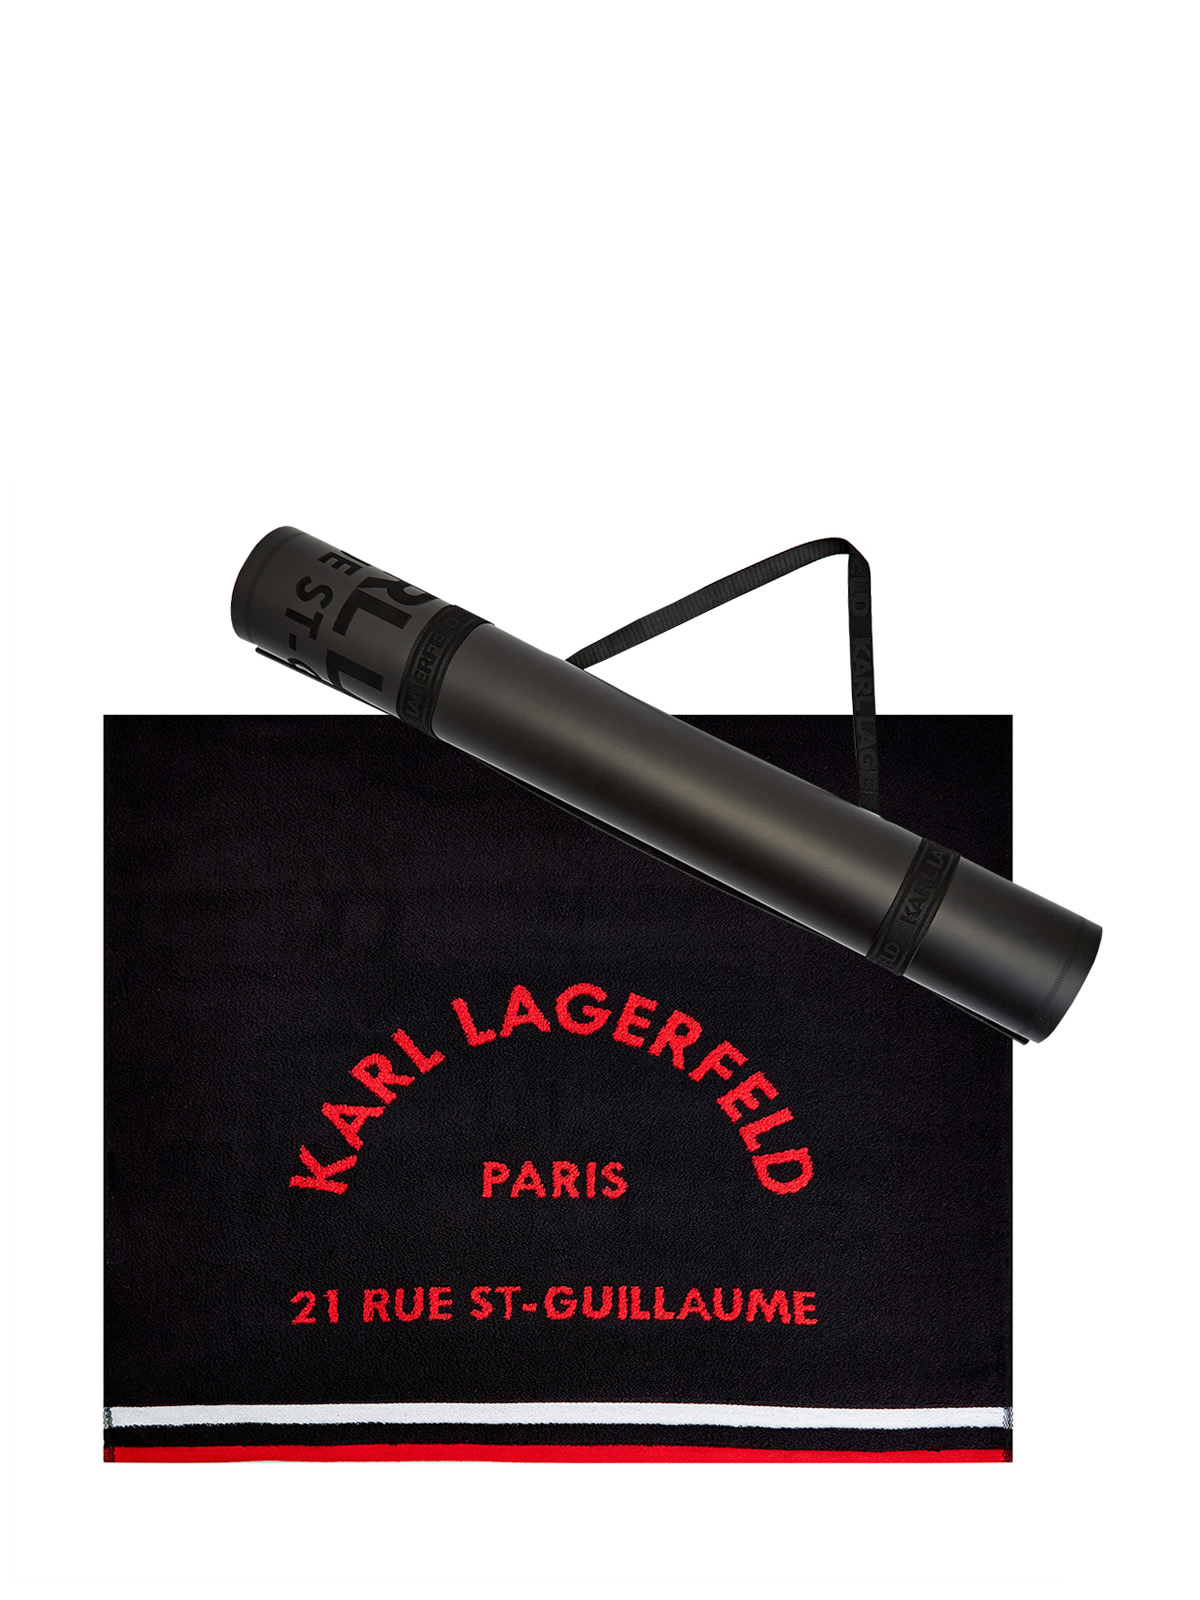 Комплект для йоги Rue St-Guillaume